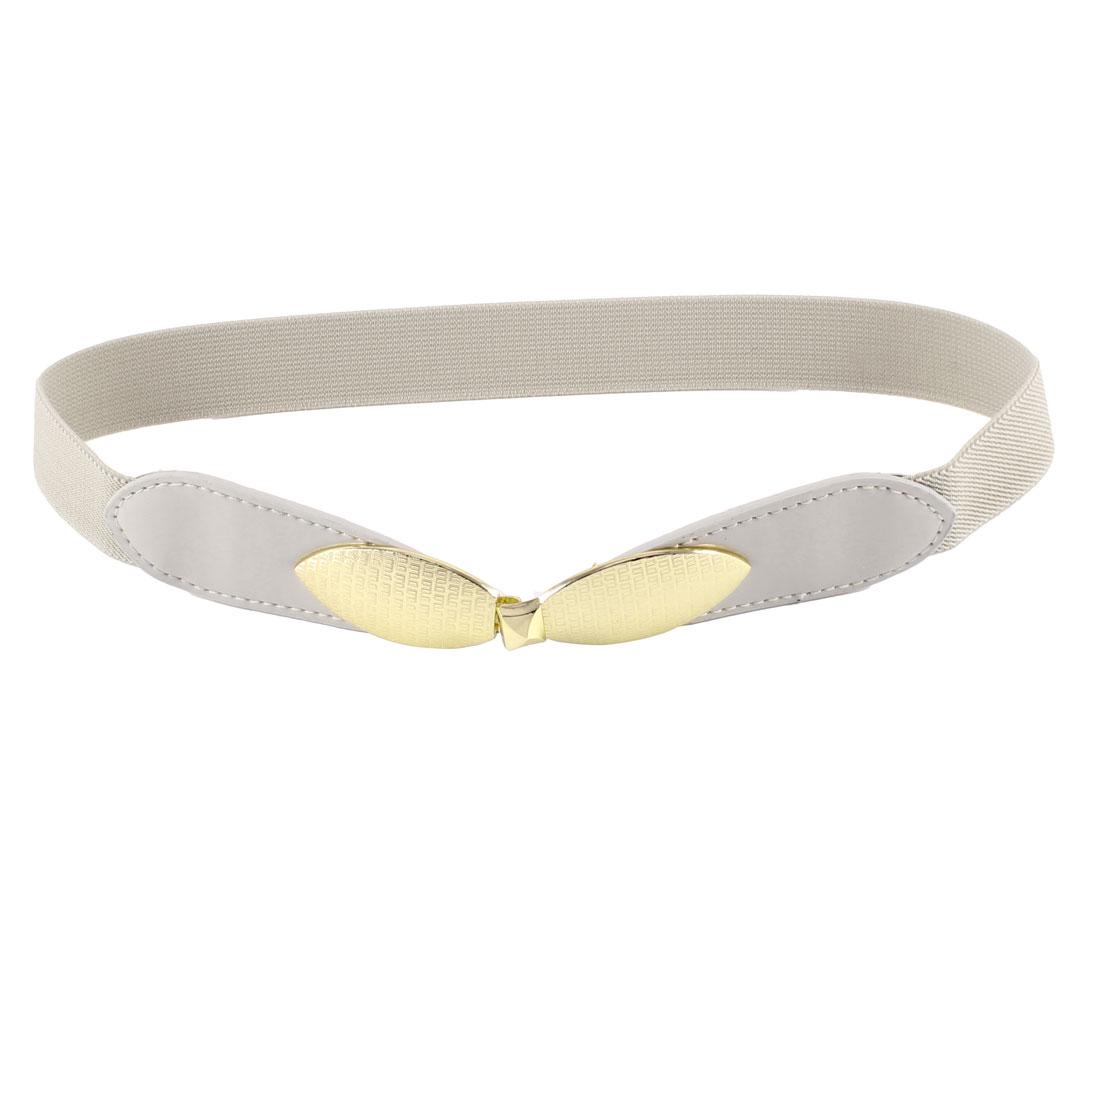 Women Interlock Buckle Faux Leather Thin Skinny Waistband Waist Belt Light Khaki